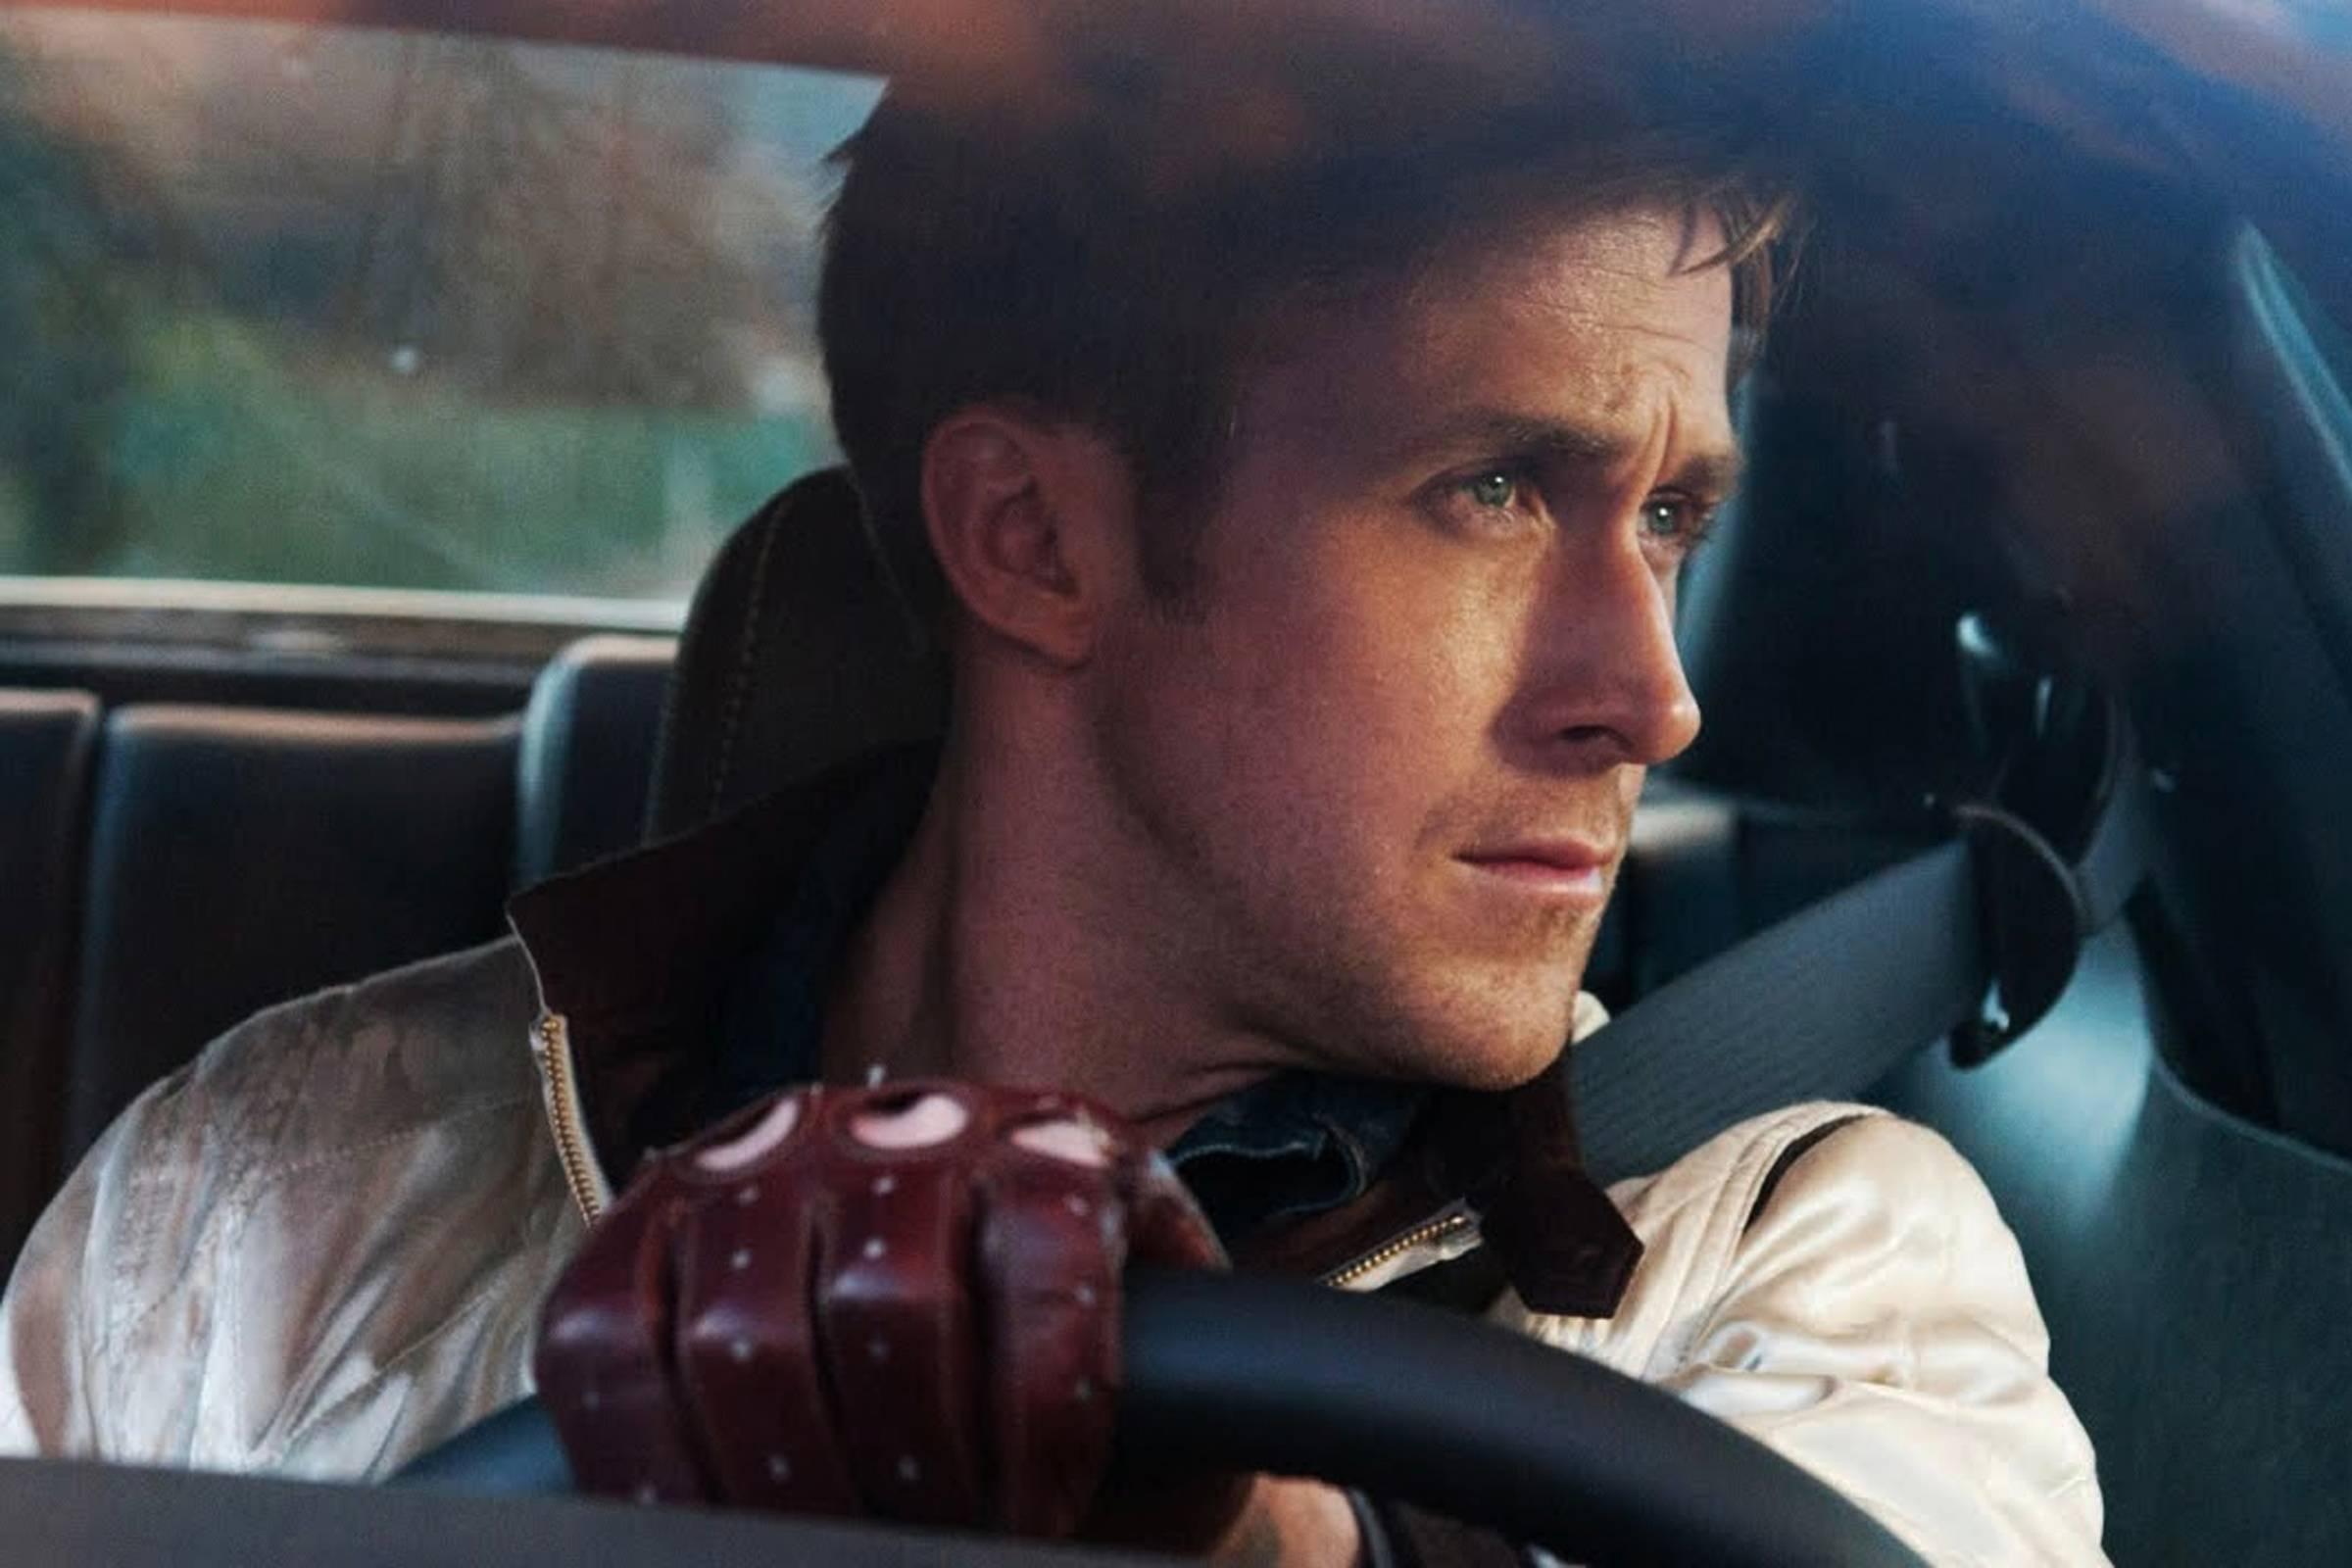 Reel Style: Our Favorite Ryan Gosling On-Screen Looks